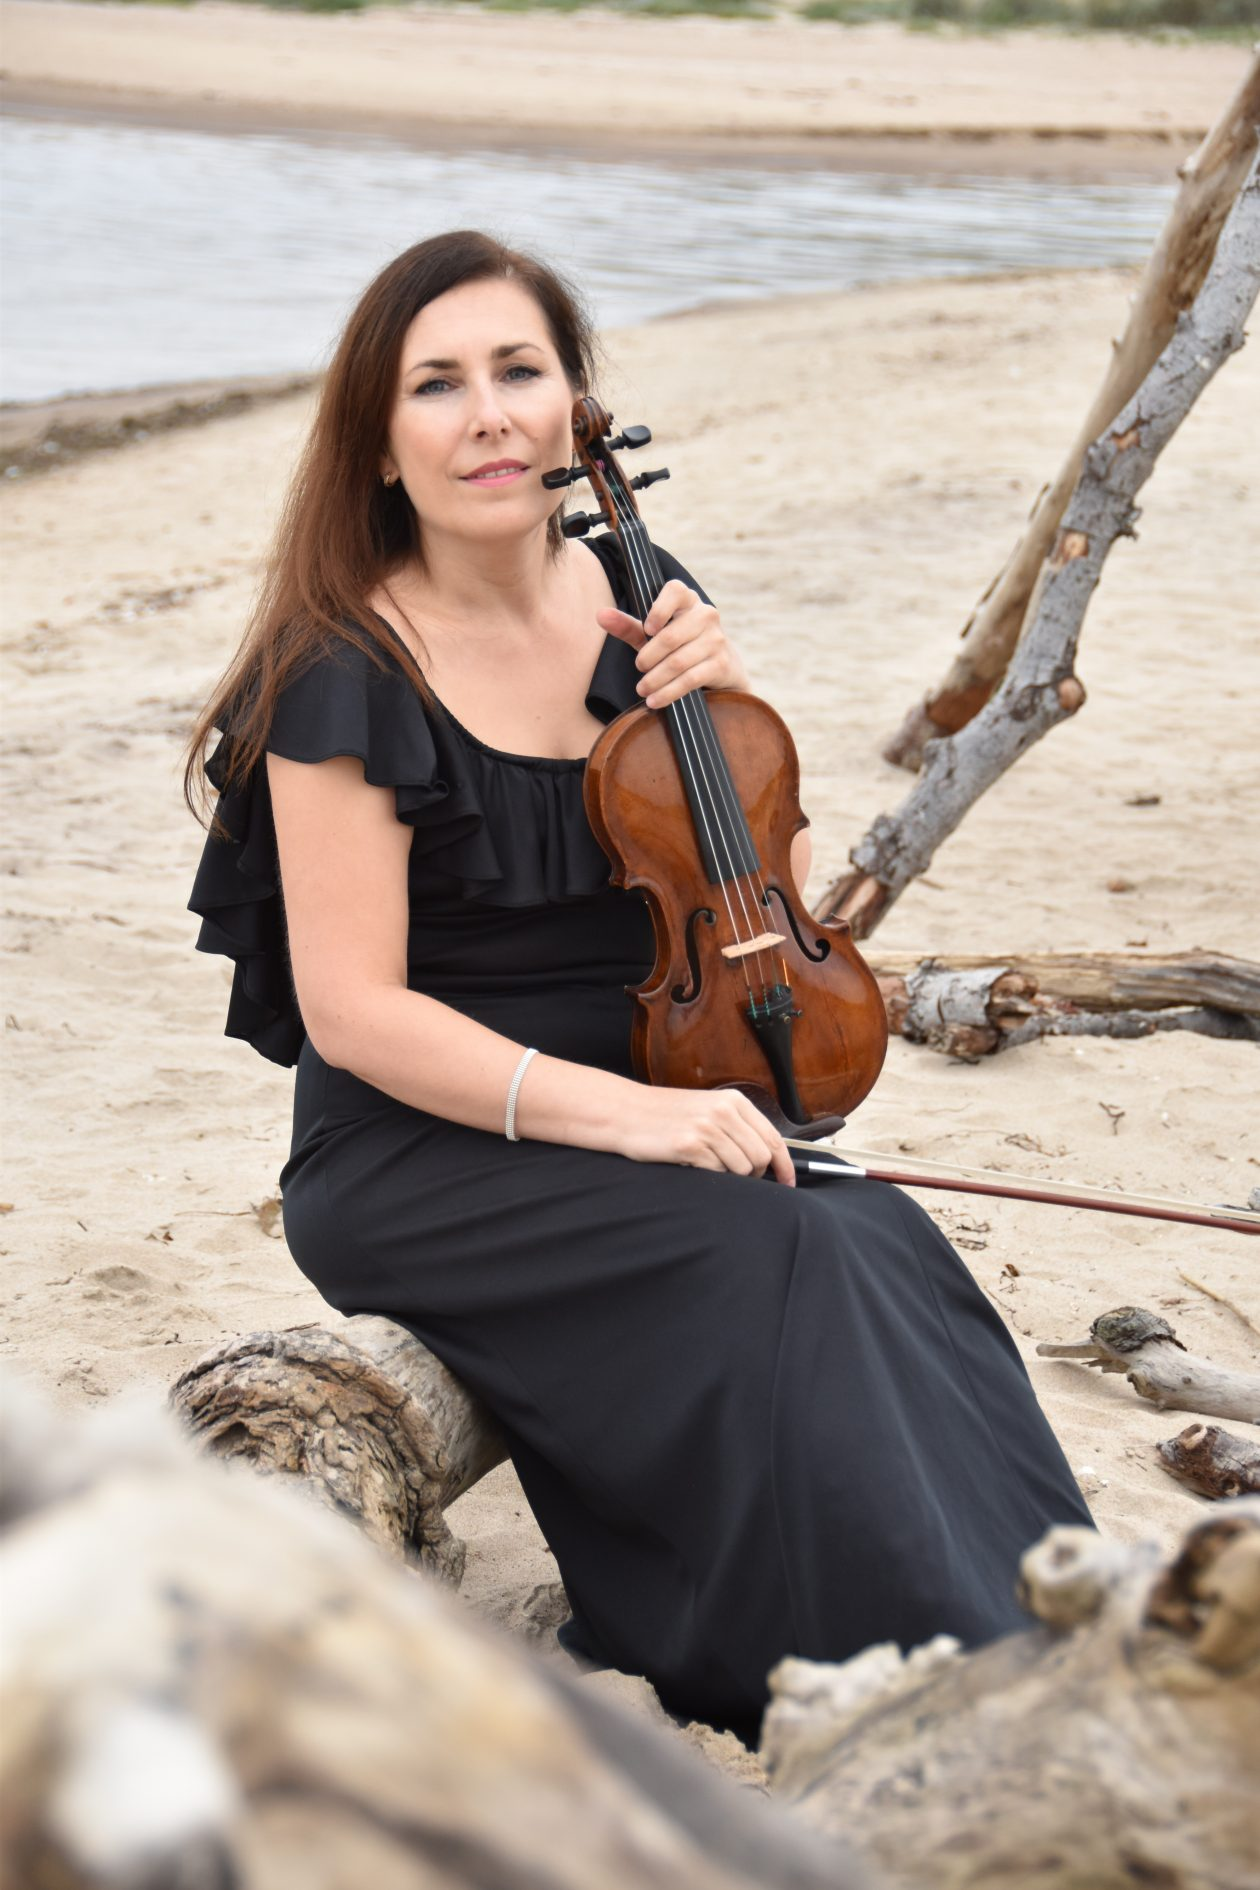 Monika Murek